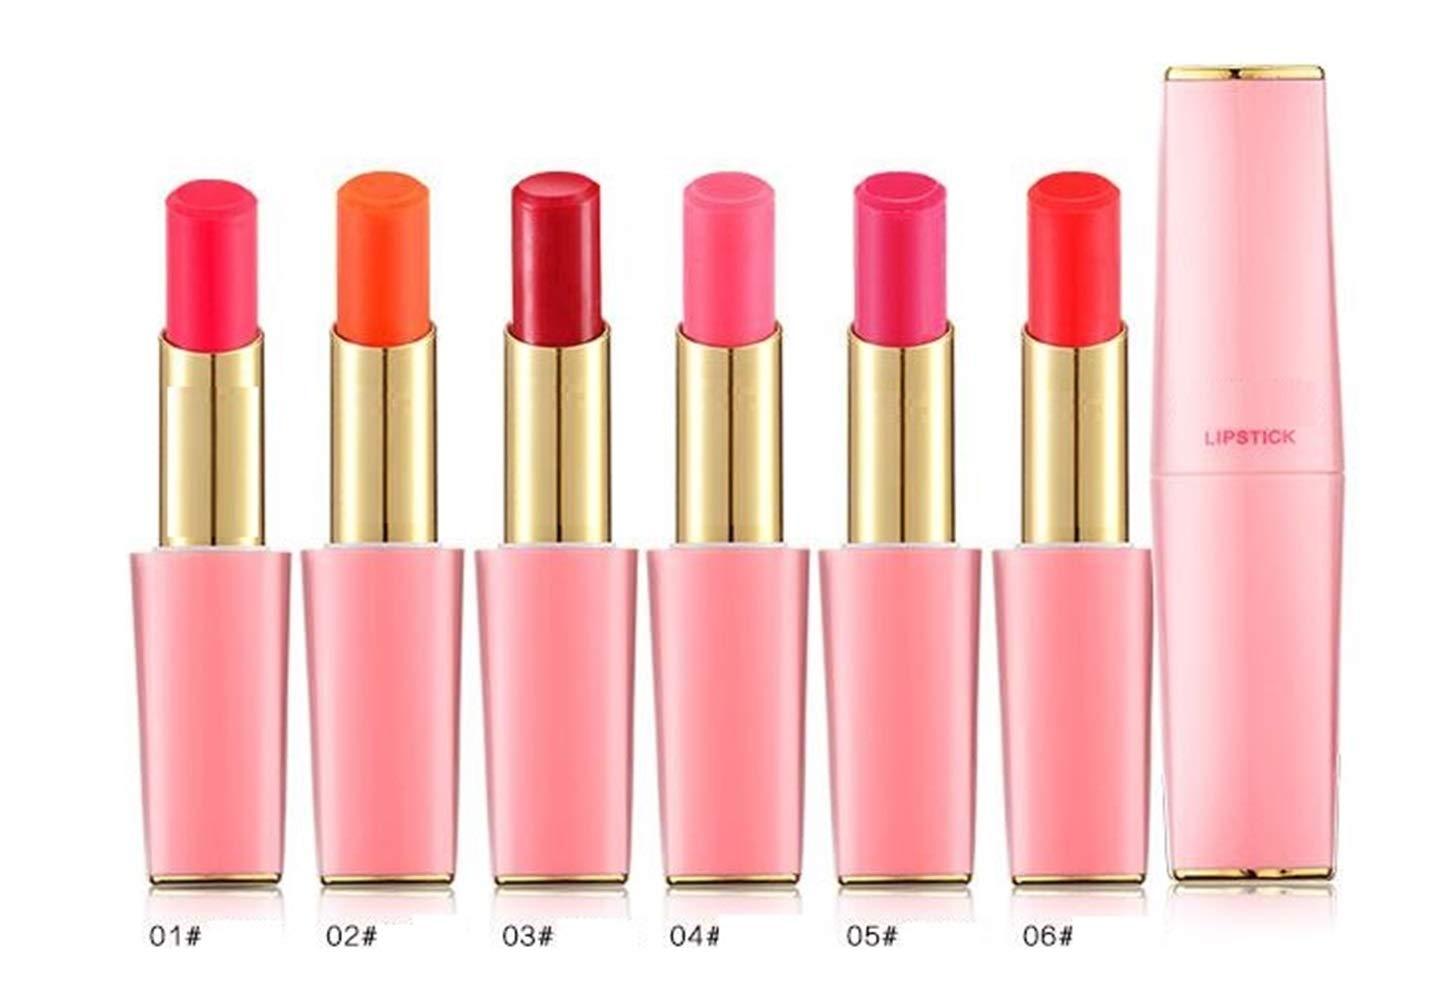 Ari_Mao Fashion Waterproof Lip Stick Cosmetics Makeup Antiaderente Cup Lipstick Lip Gloss (Colore : 01#)